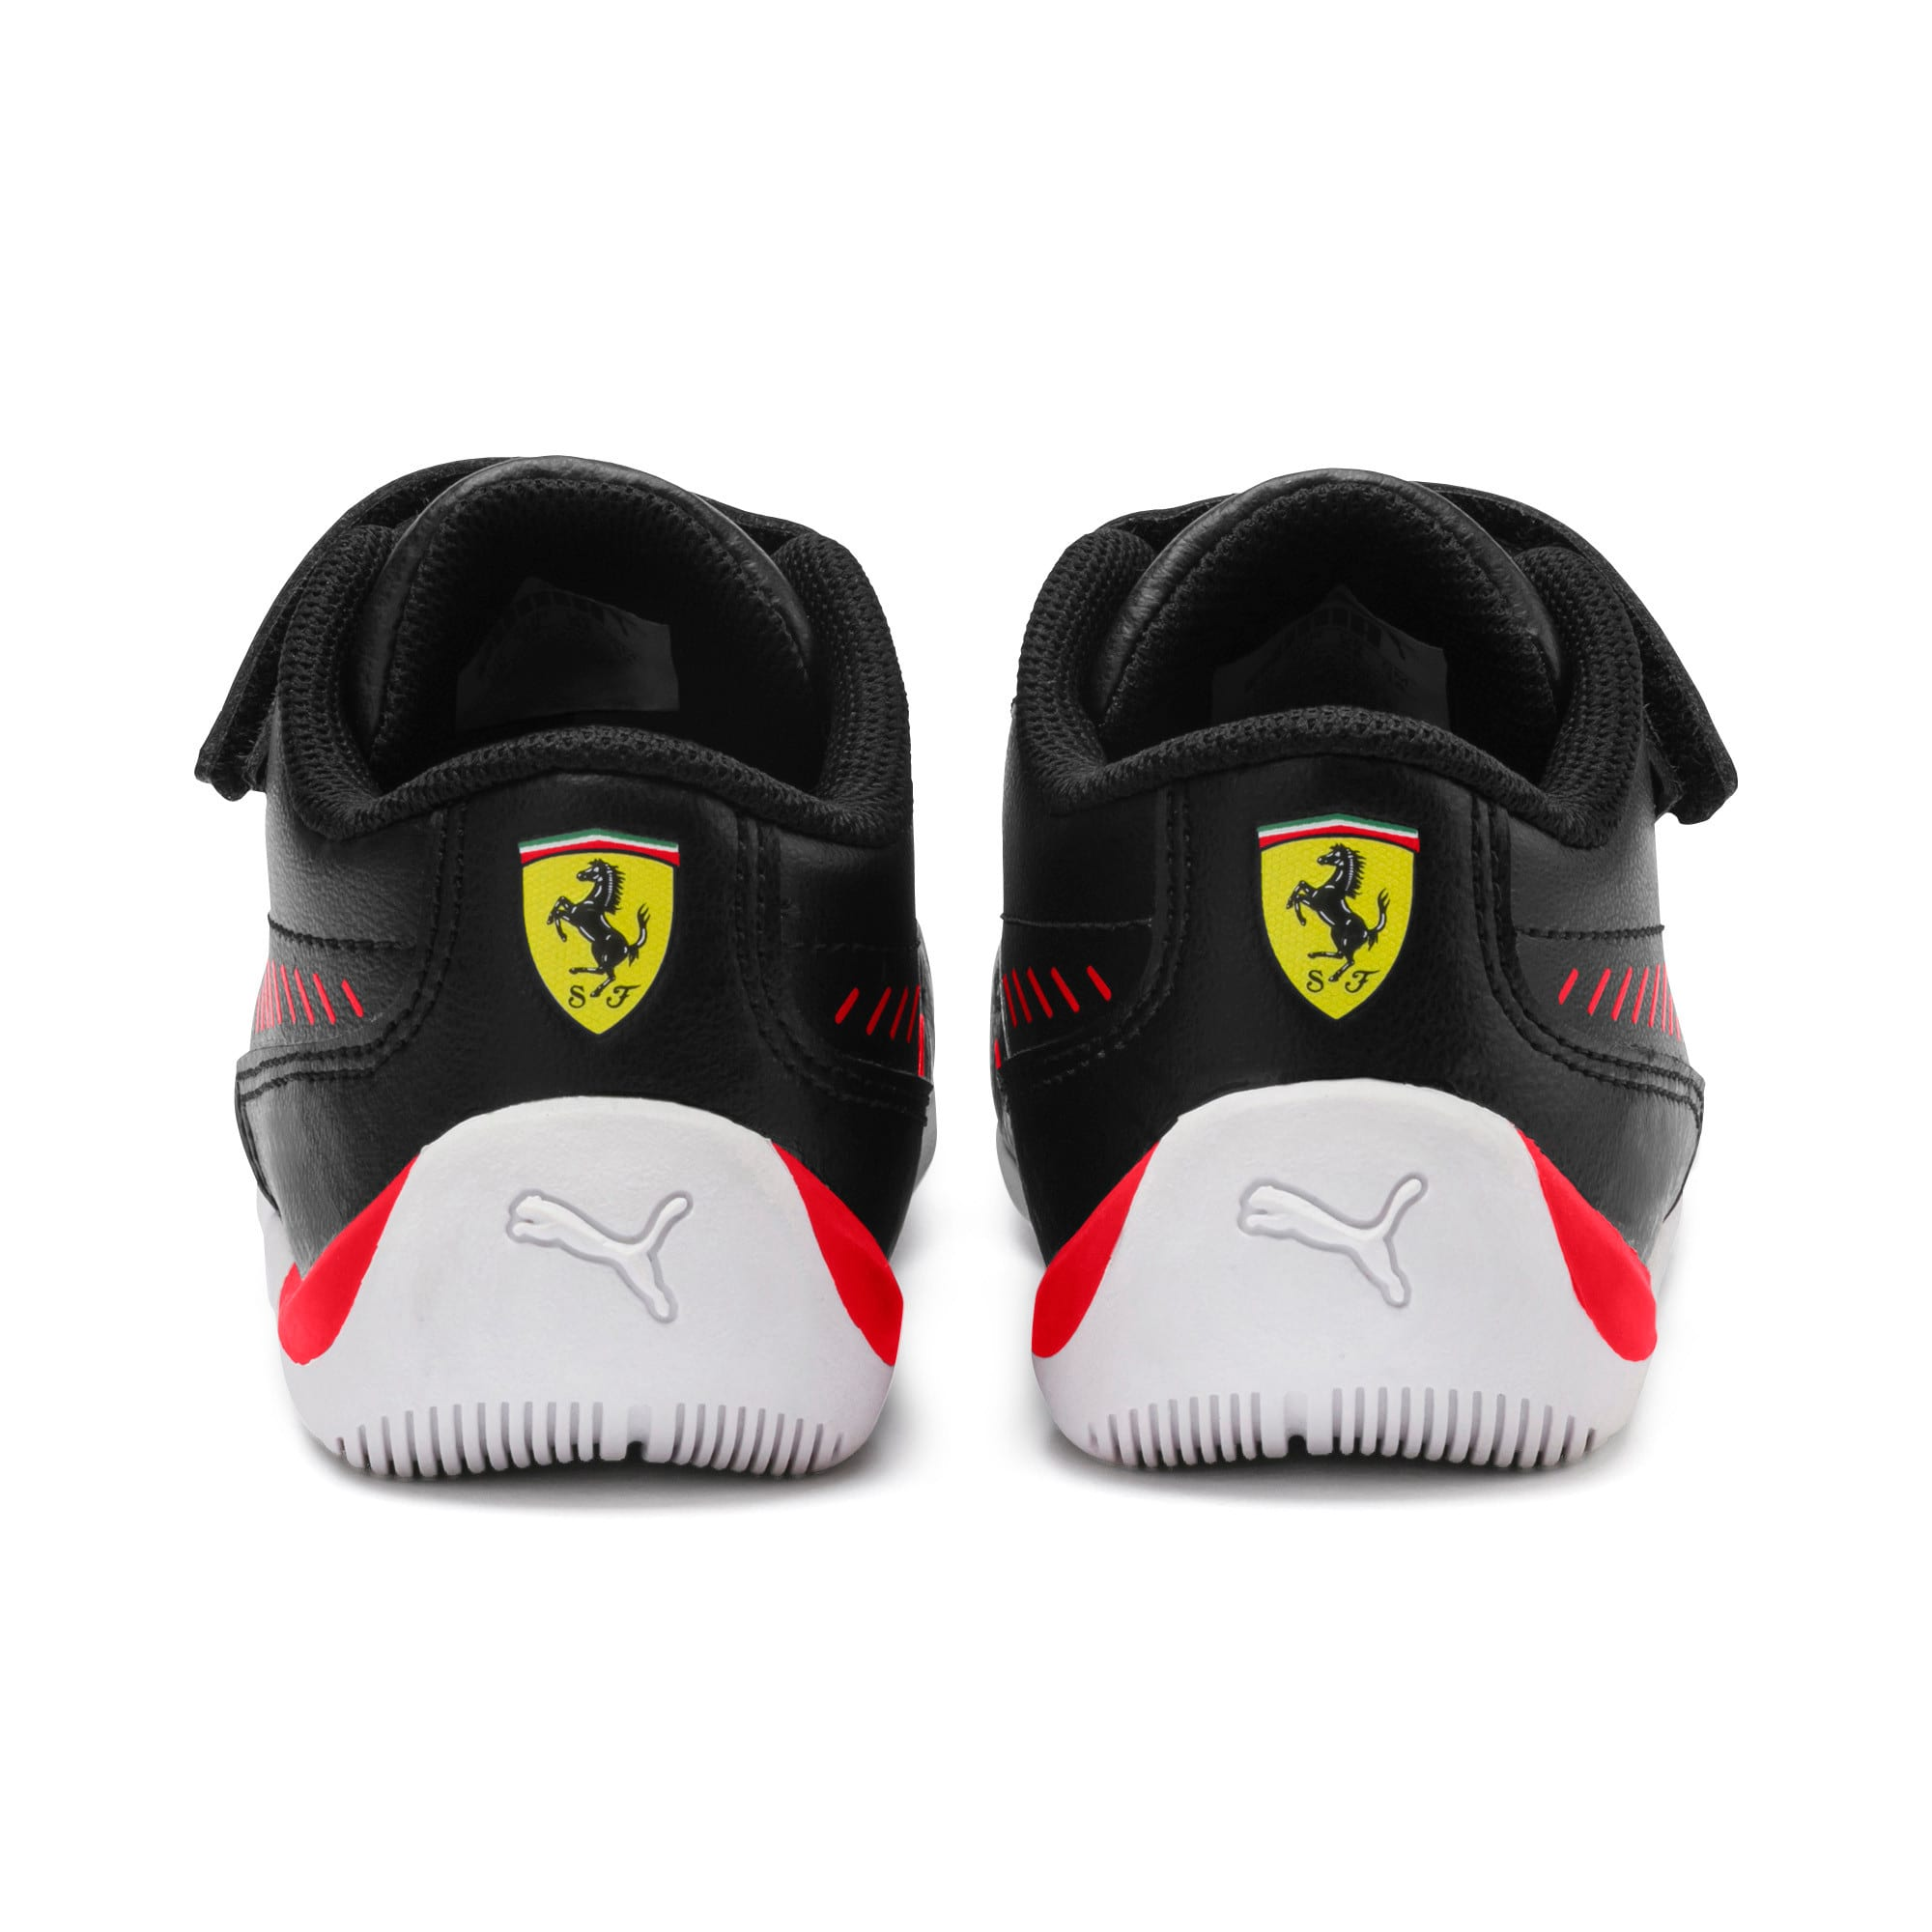 Thumbnail 3 of Basket Ferrari Drift Cat 7S Kids, Puma Black-Rosso Corsa, medium